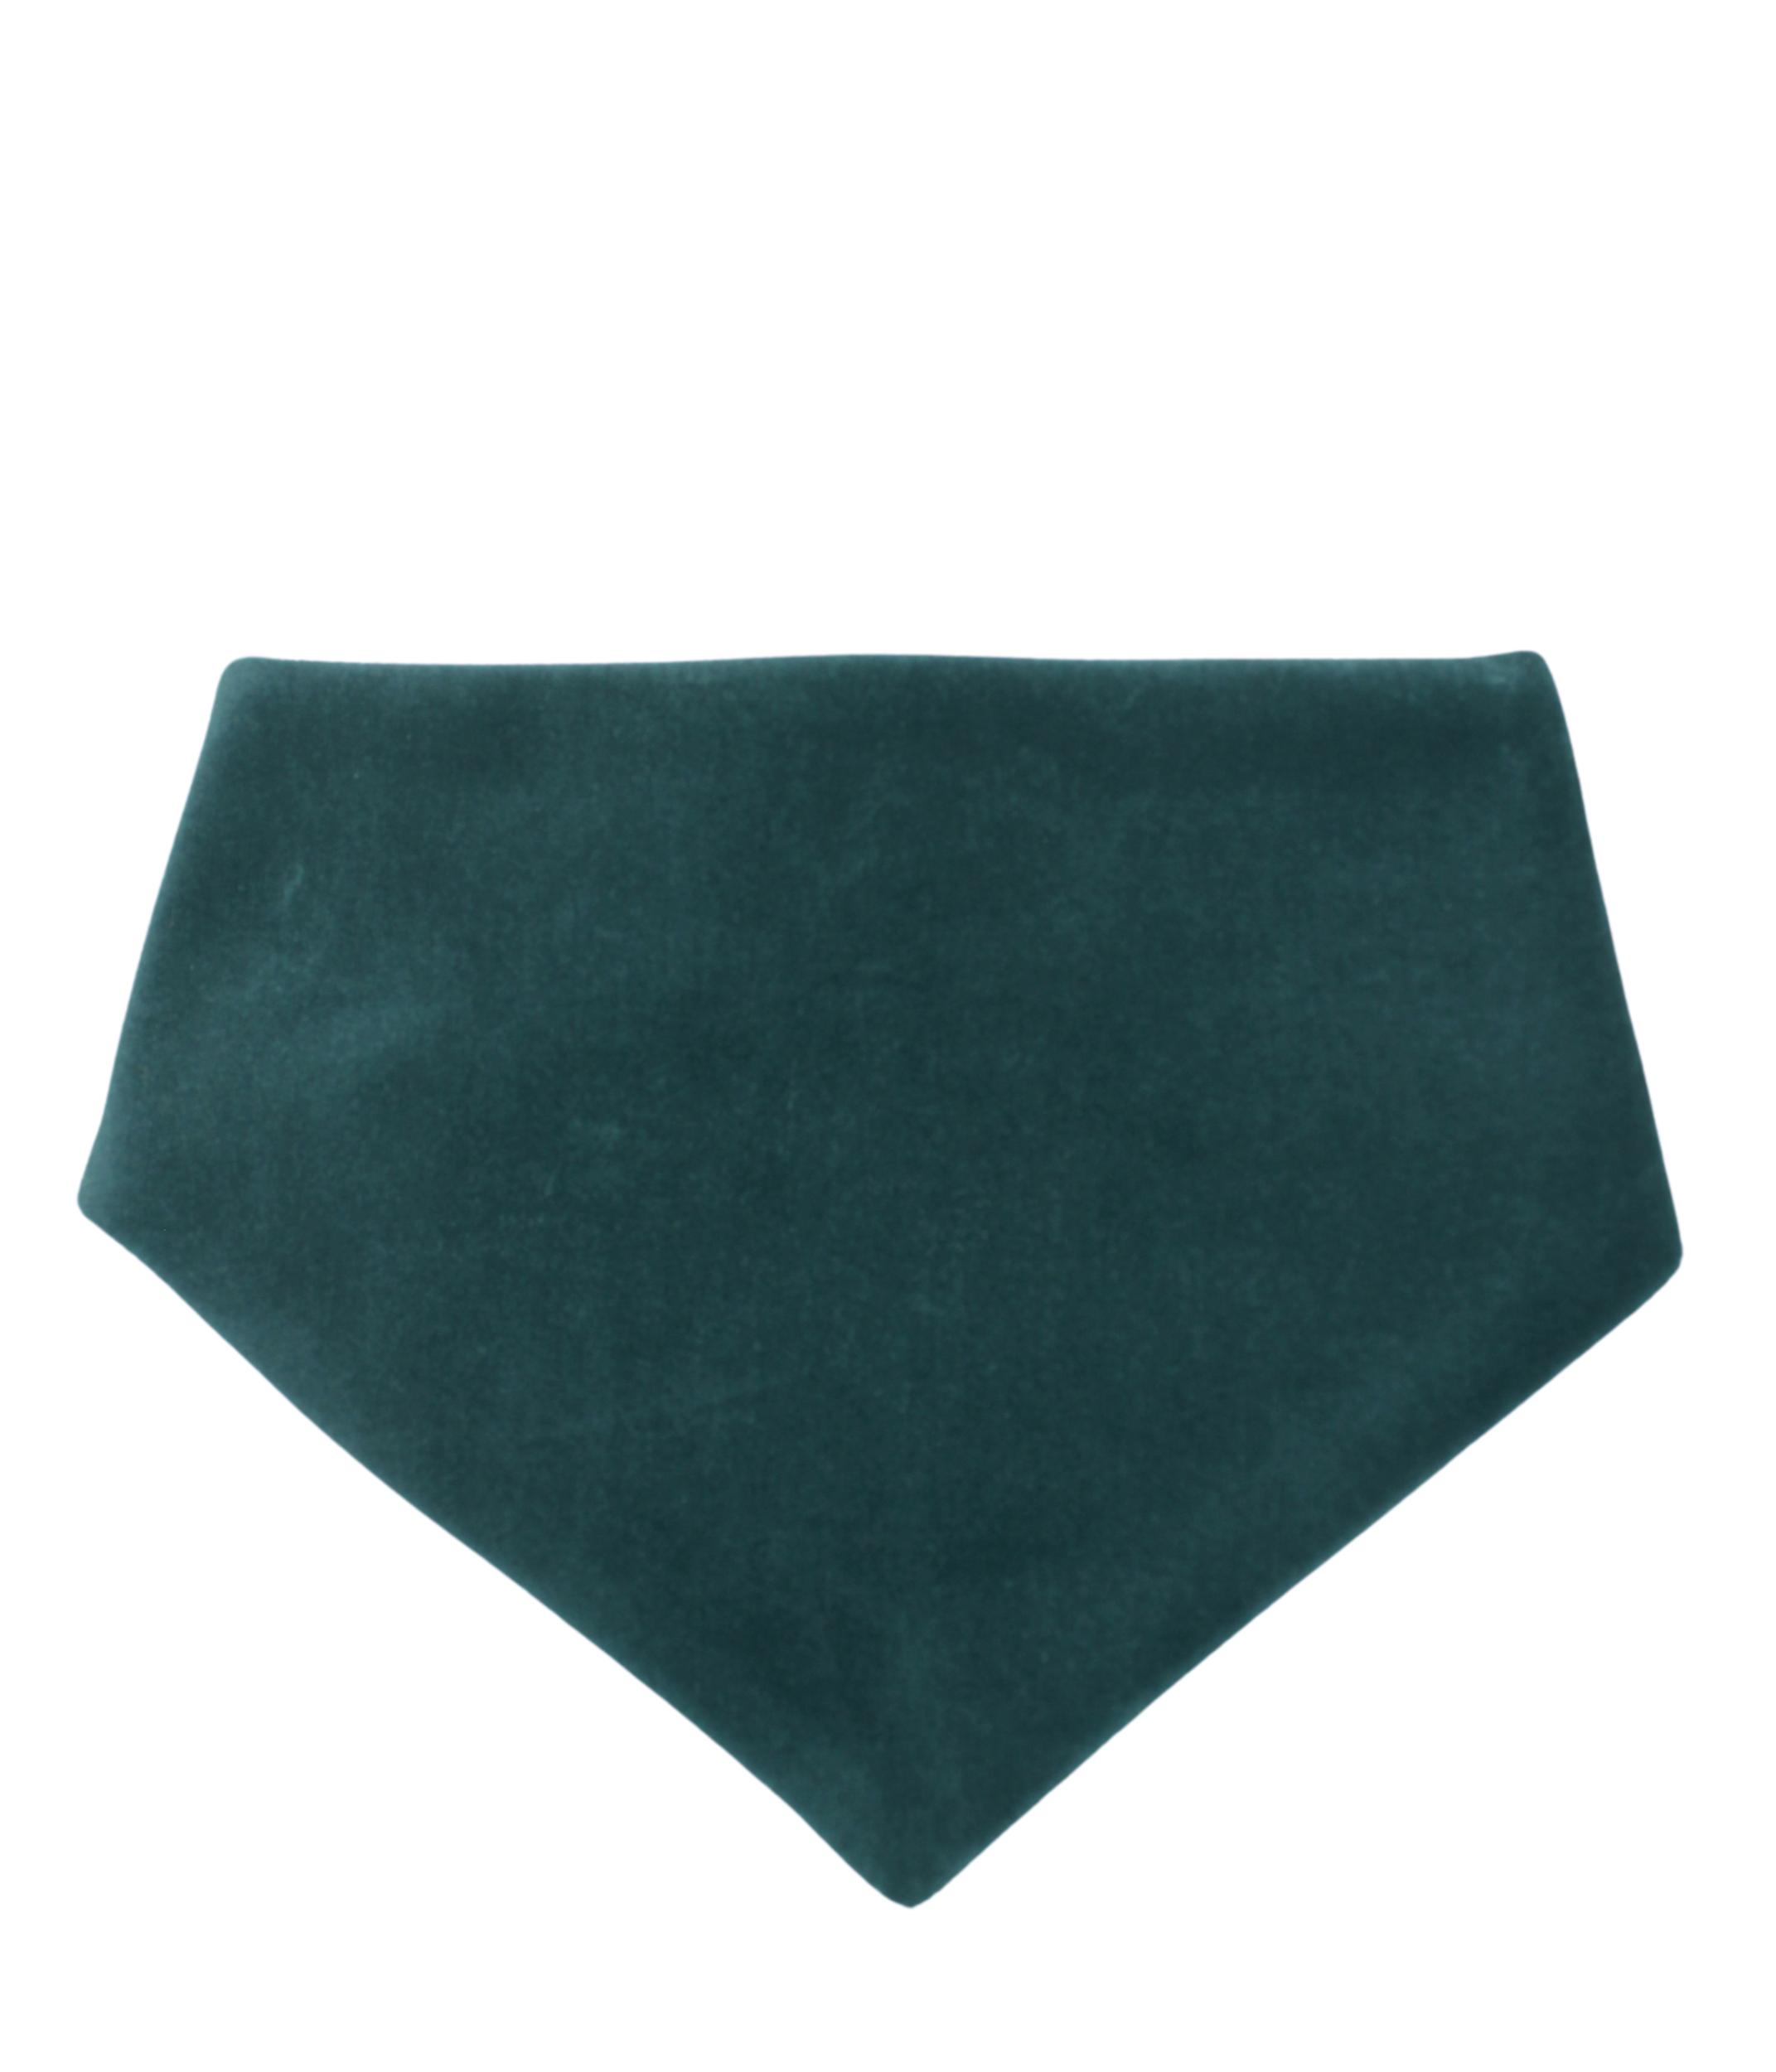 Bavoir bandana - DARK GREEN